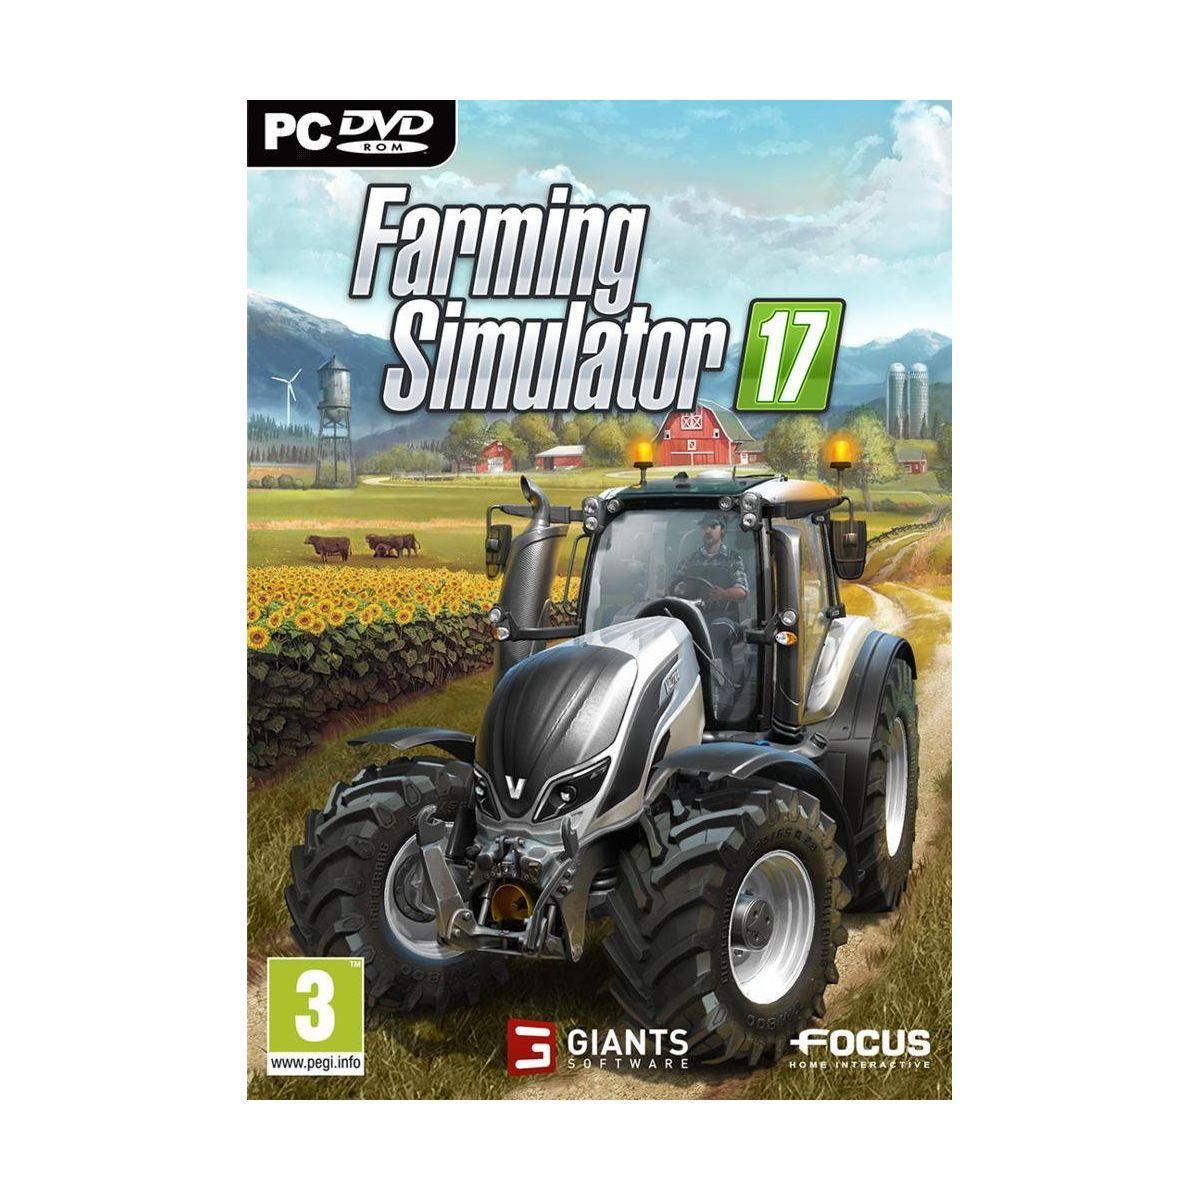 Jeu pc focus farming simulator 2017 - 3% de remise immédiate avec le code : multi3 (photo)